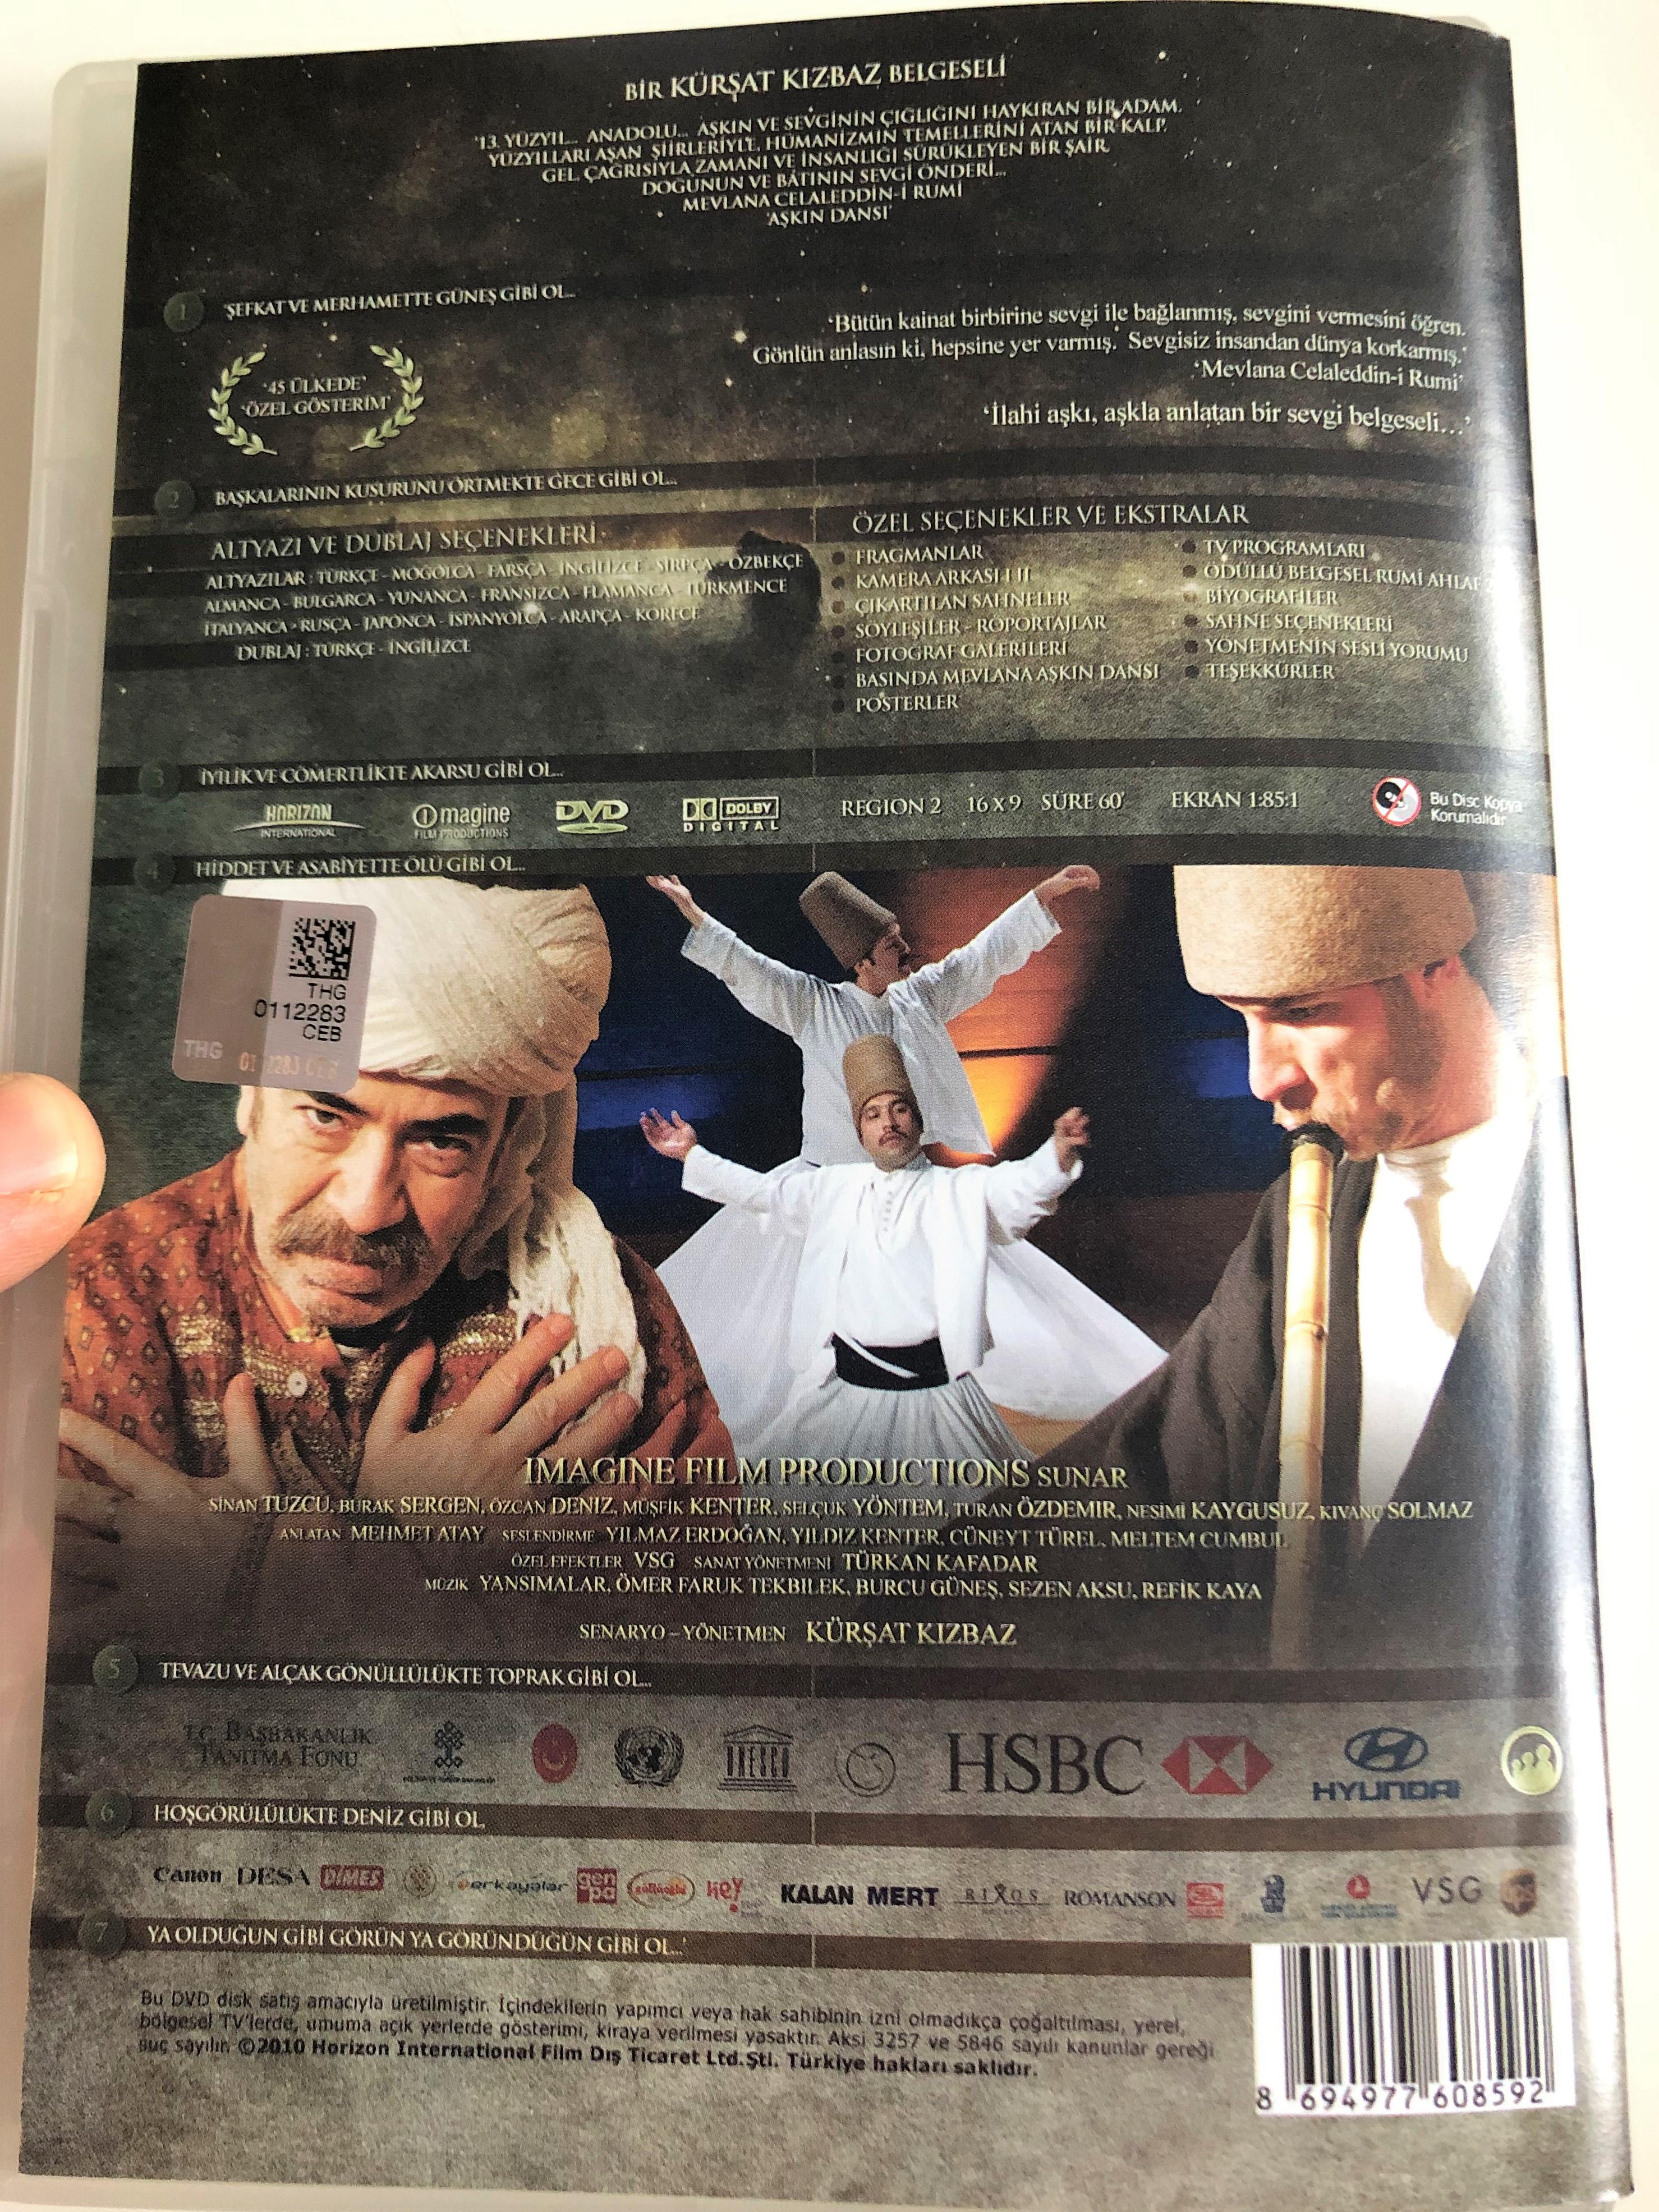 mevlana-celaleddin-i-rumi-a-k-n-dans-dvd-2008-rumi-dance-of-love-directed-by-k-r-at-kizbaz-starring-sinan-tuzcu-burak-sergen-zcan-deniz-2-.jpg